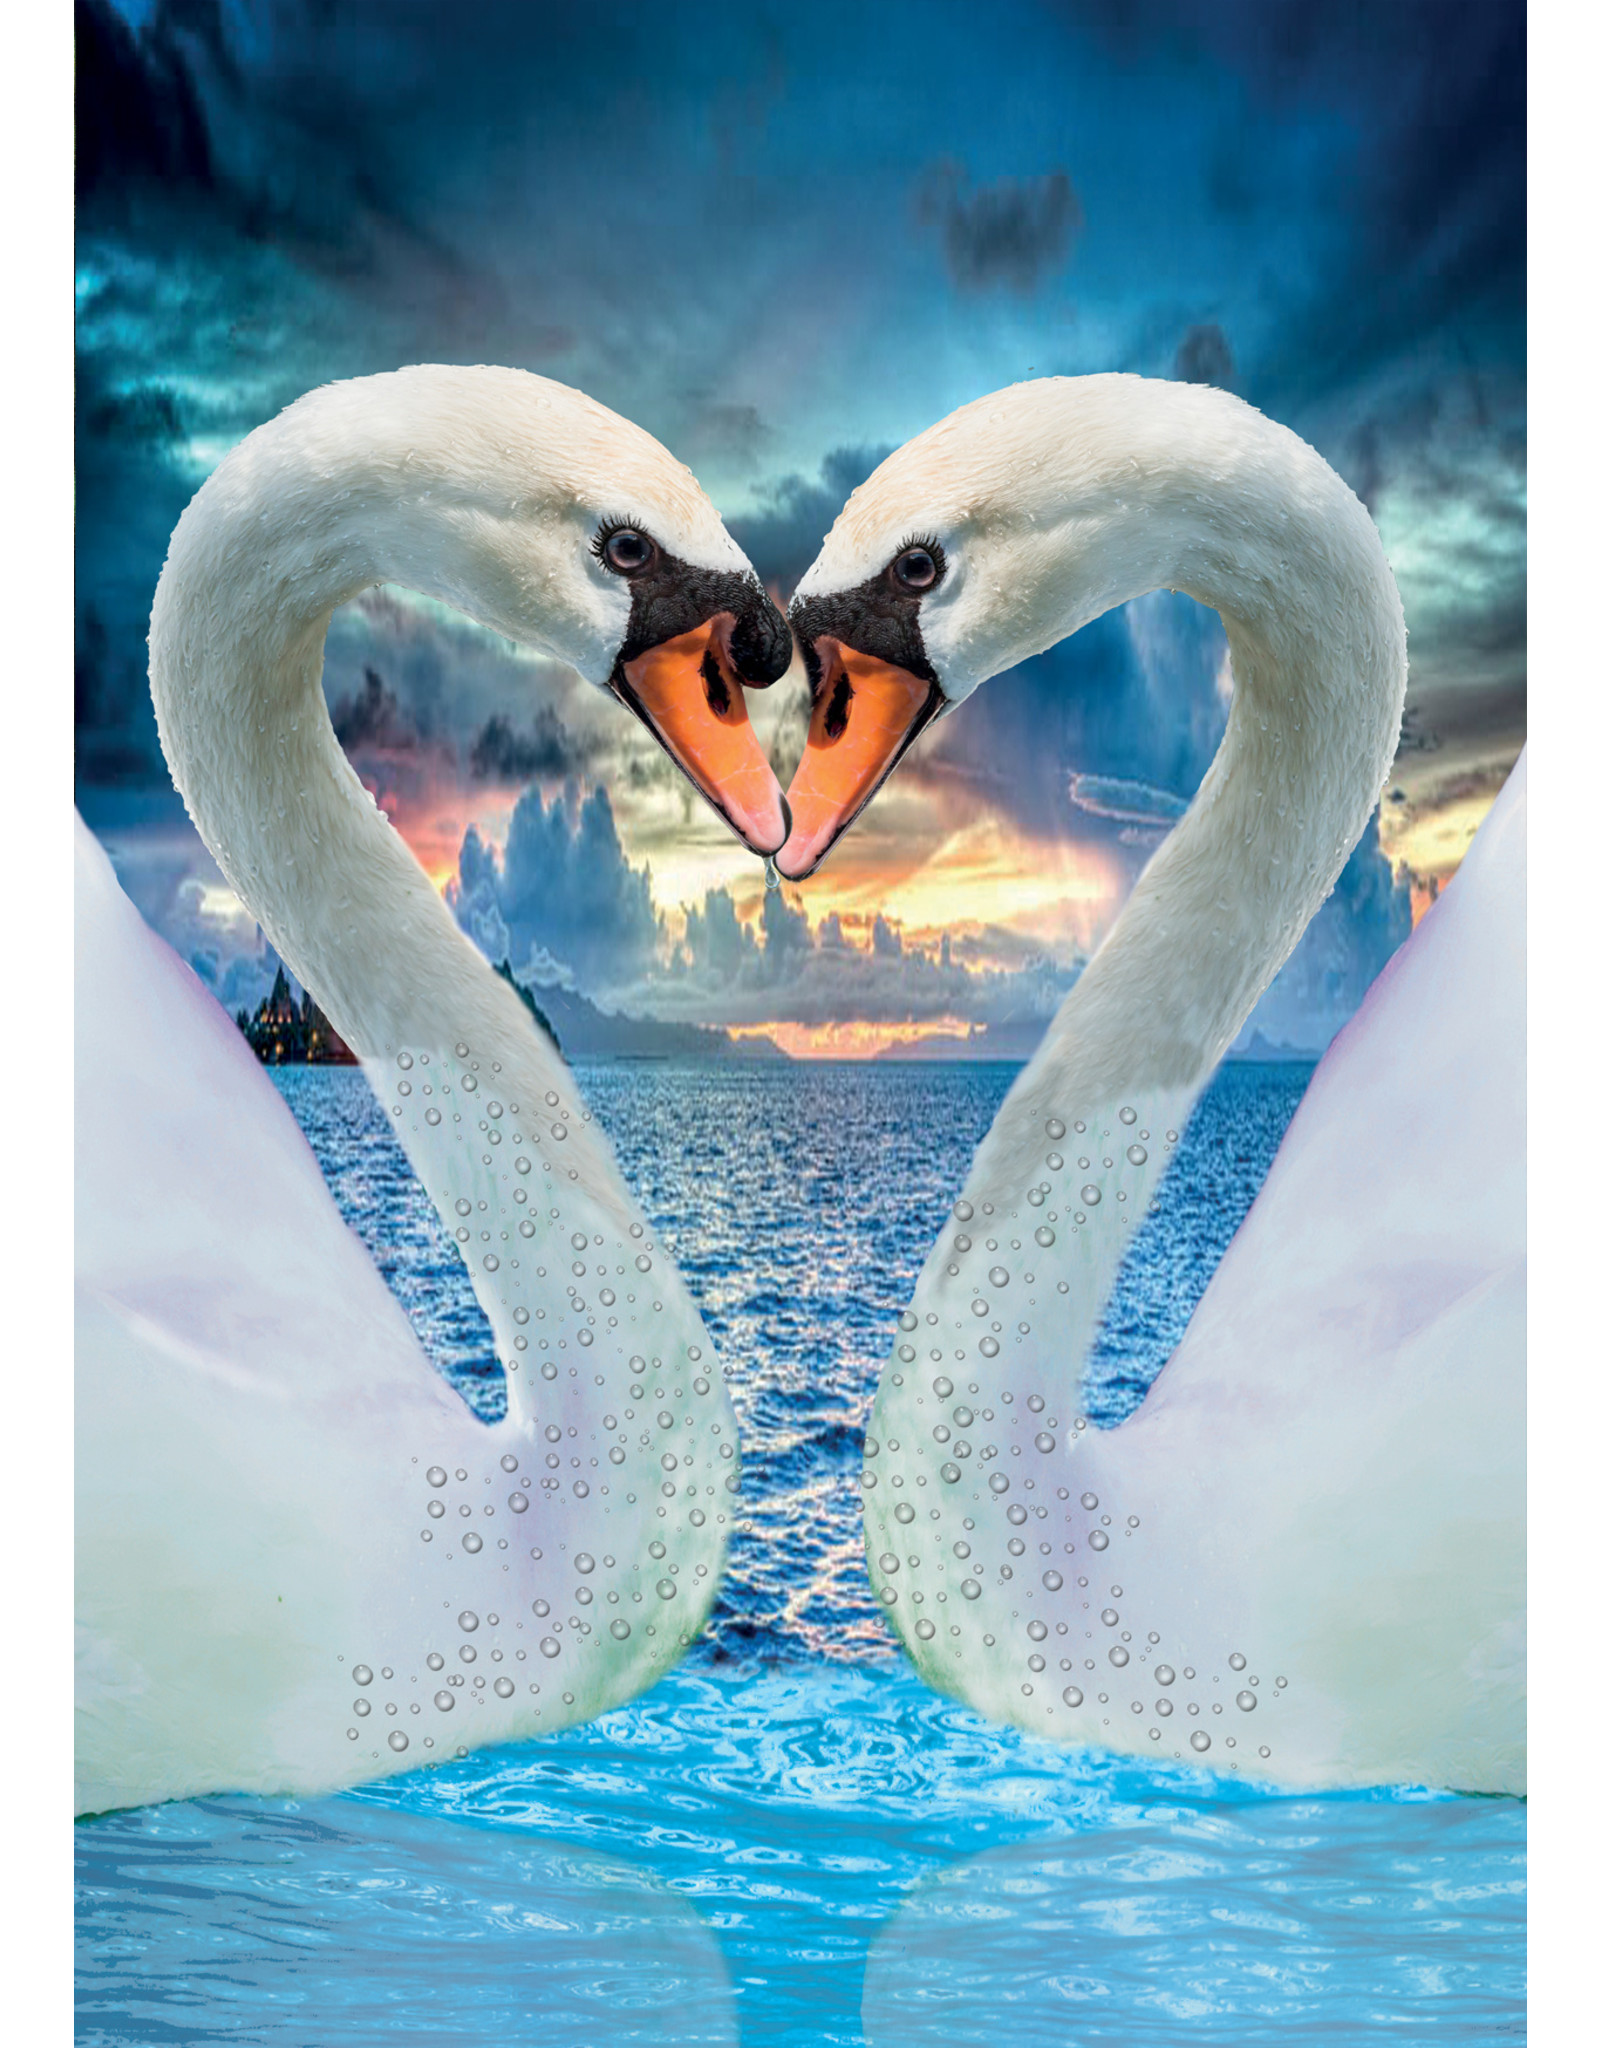 De Kunstboer - Swans